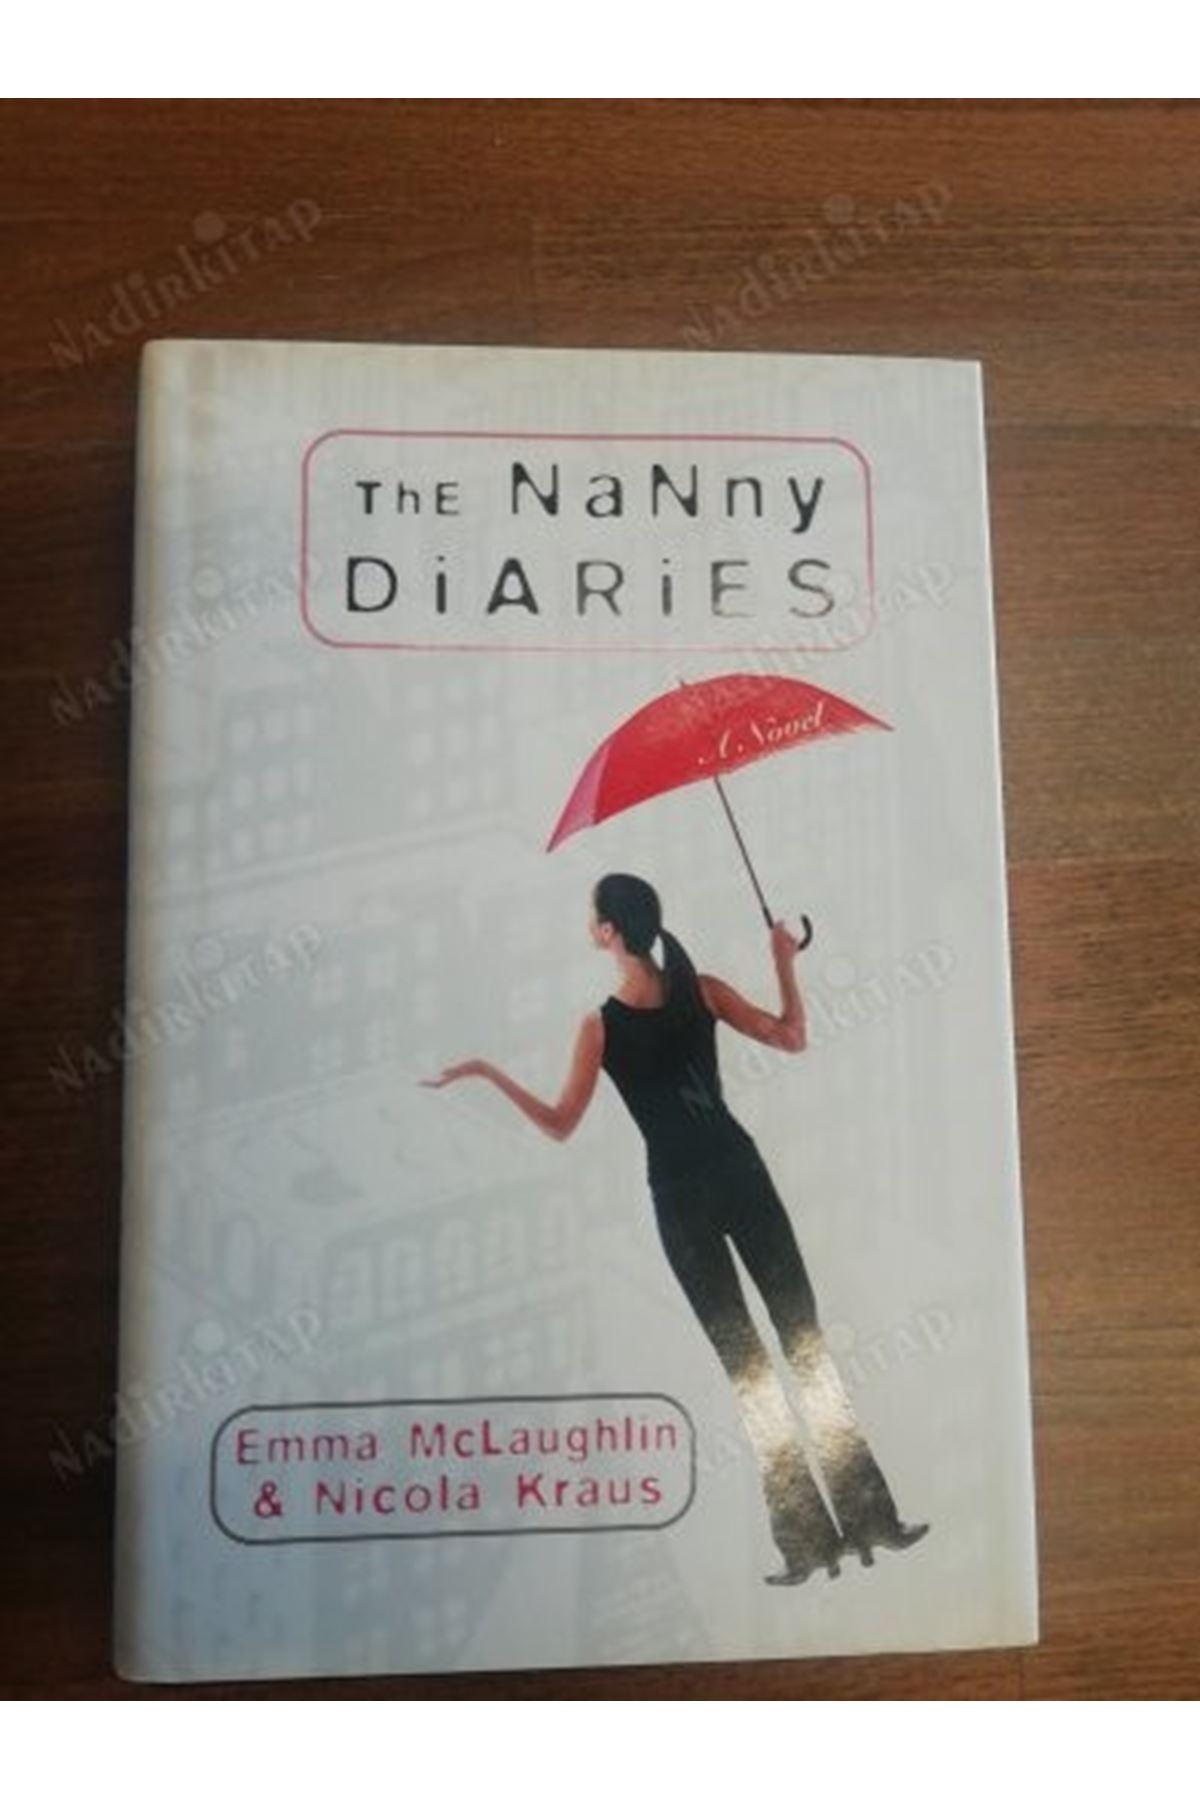 EMMA MCLAUGHLIN - THE NANNY DIARIES